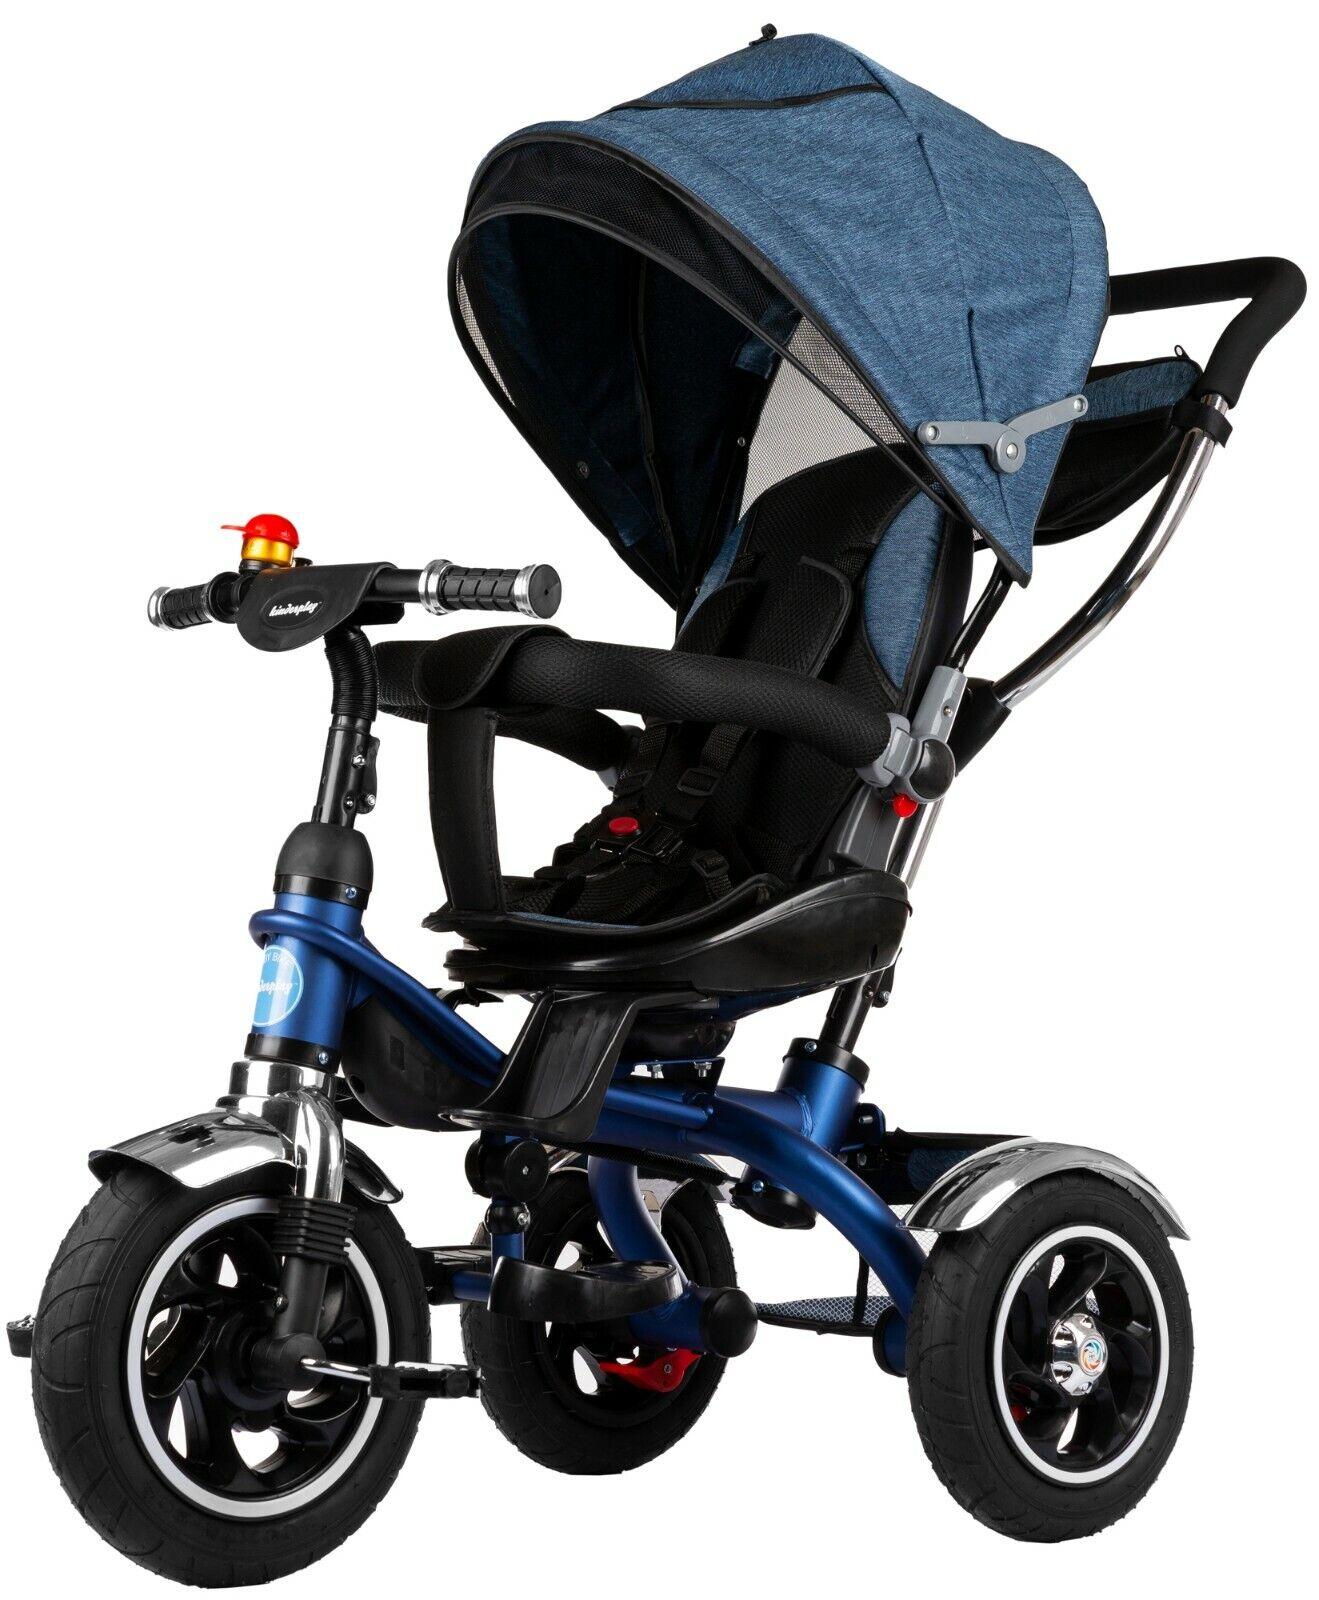 Dreirad Kinderdreirad Kinder Lenkstange Fahrrad KP0565DBL Baby Kinderwagen Neu